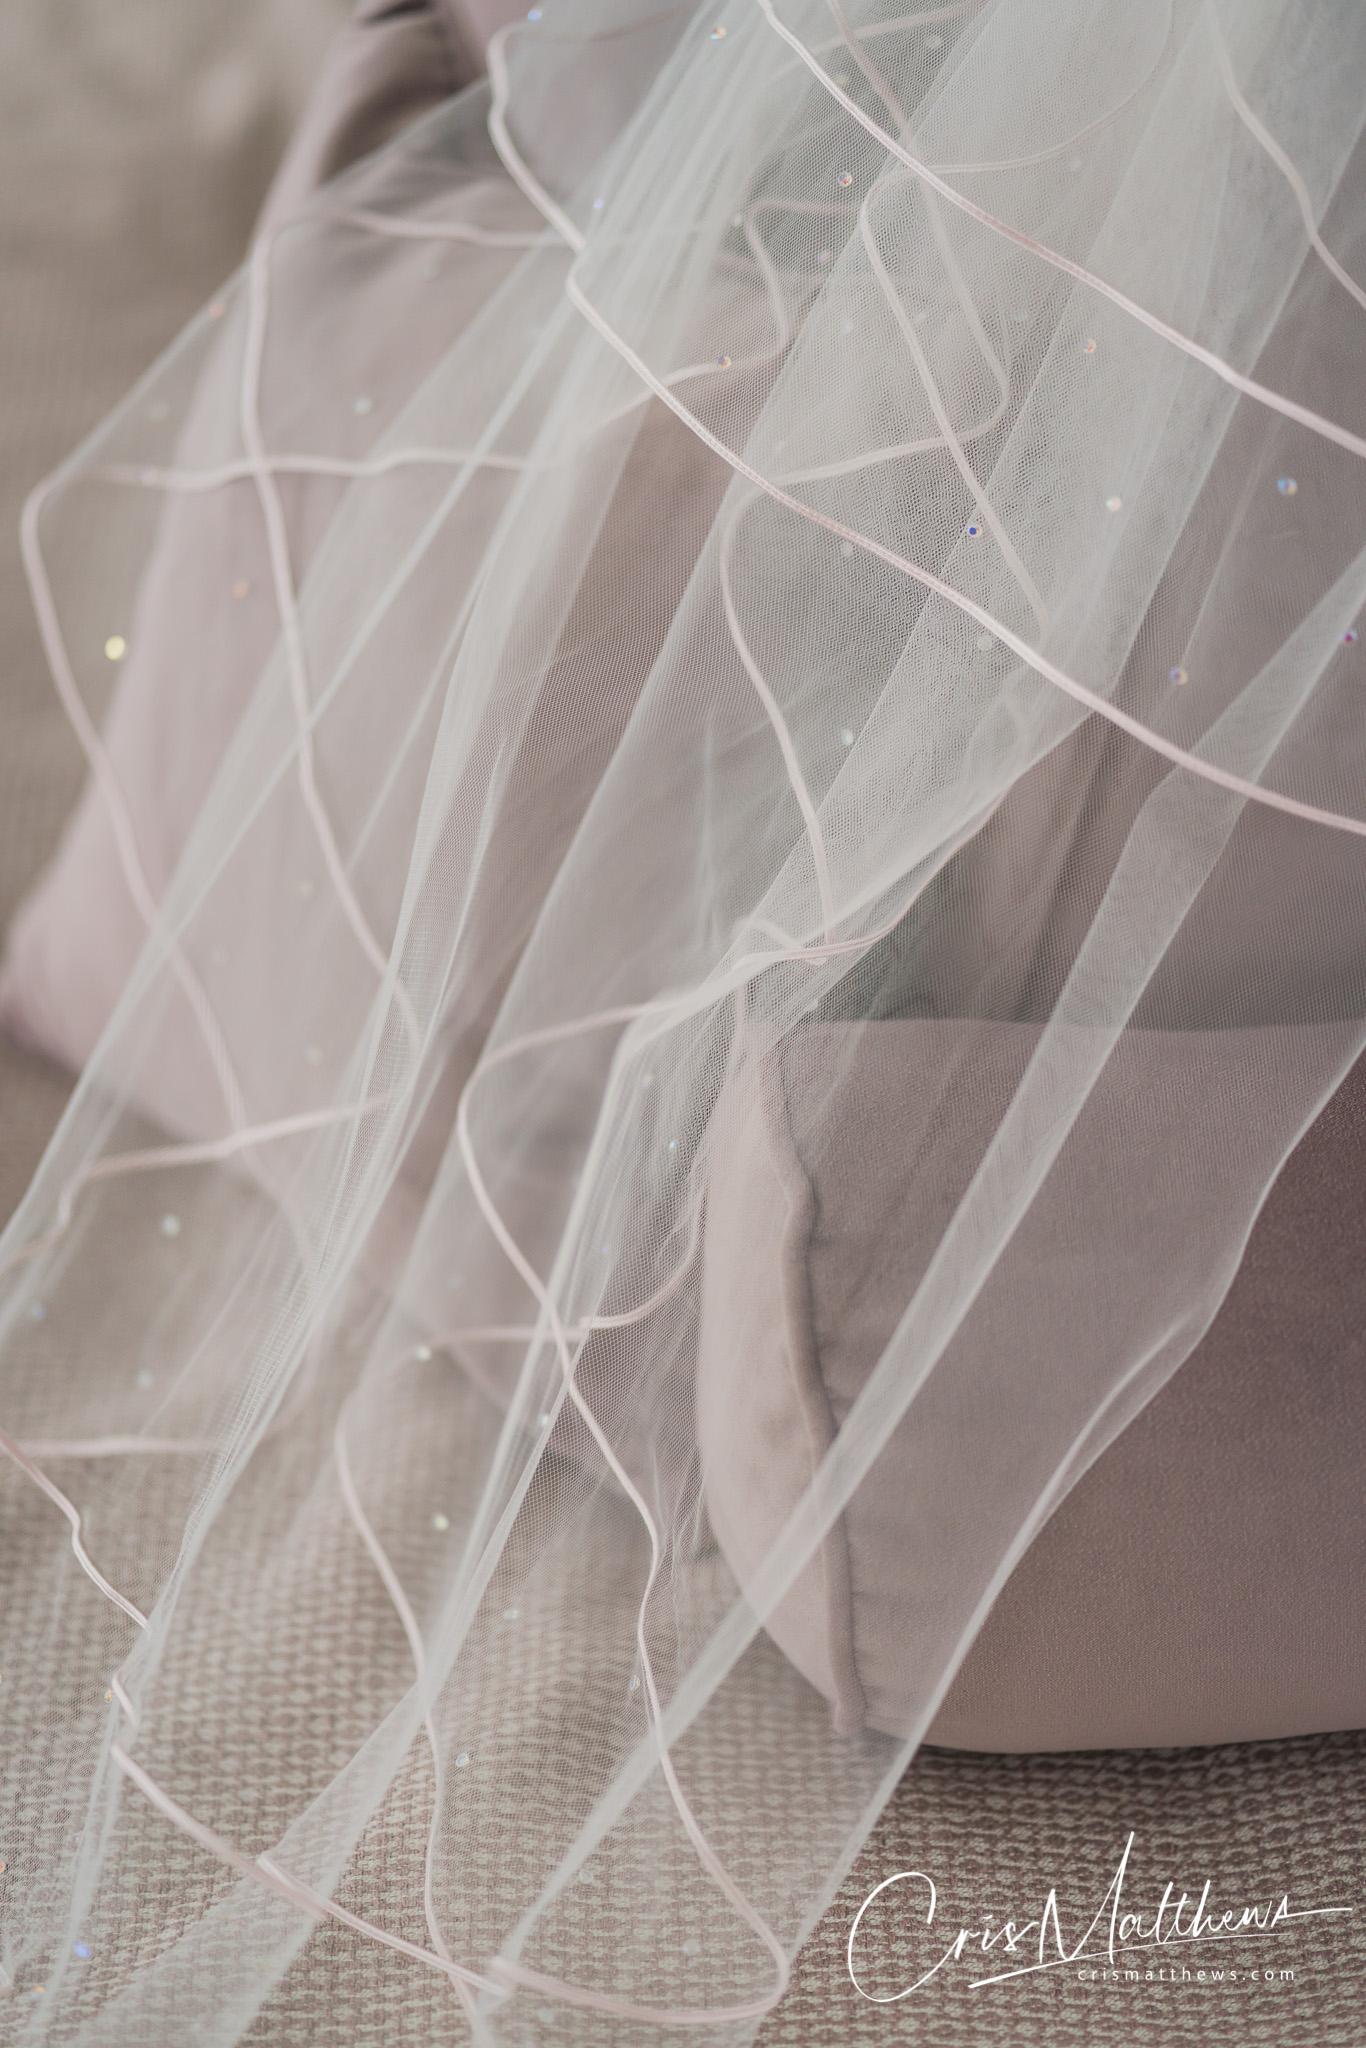 Bridal Veil at Hawkstone Hall Wedding Photography